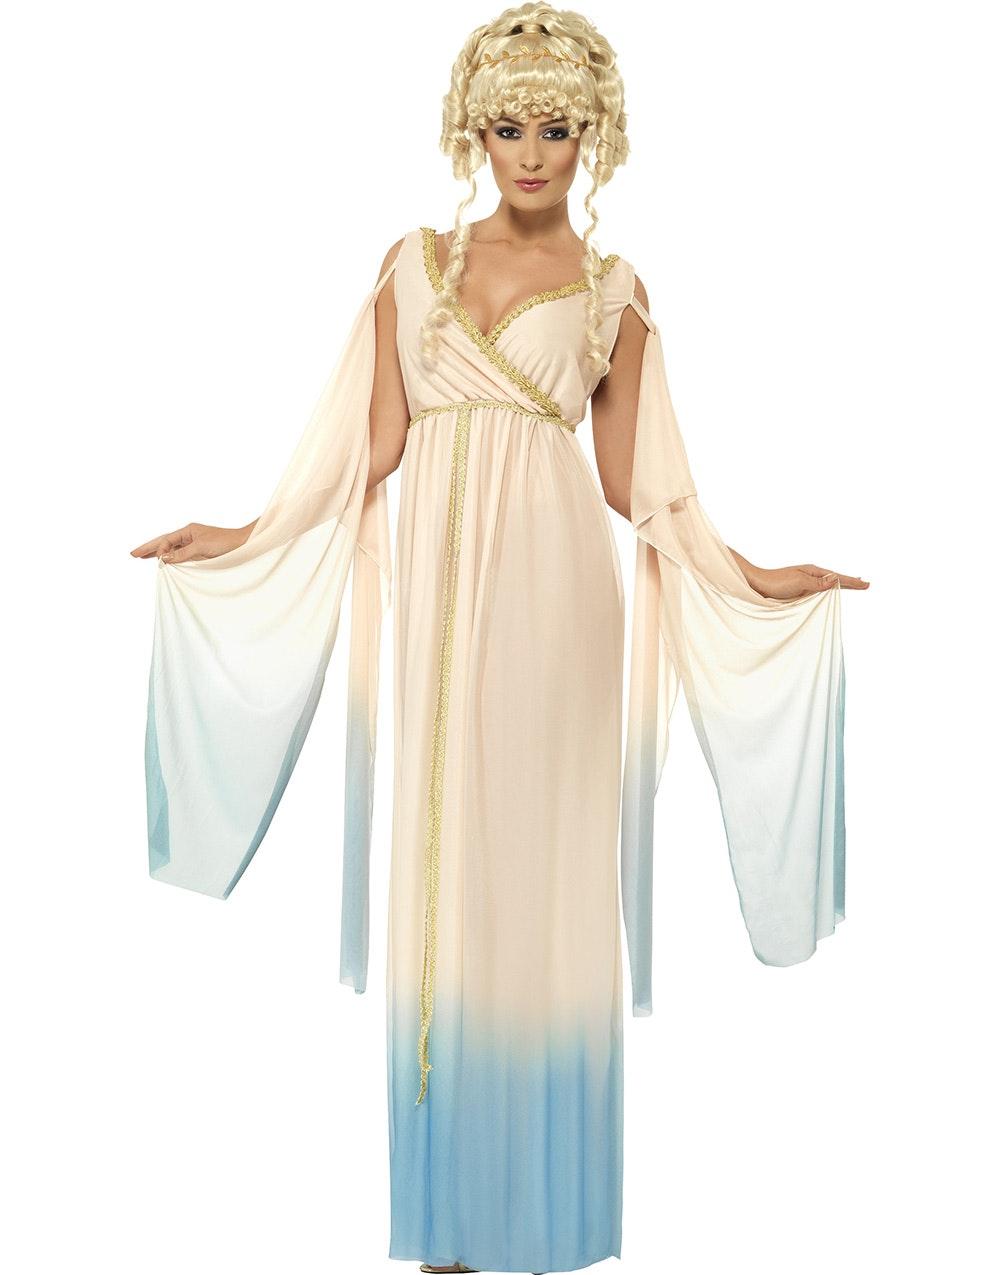 gresk gudinne kostyme private xxx